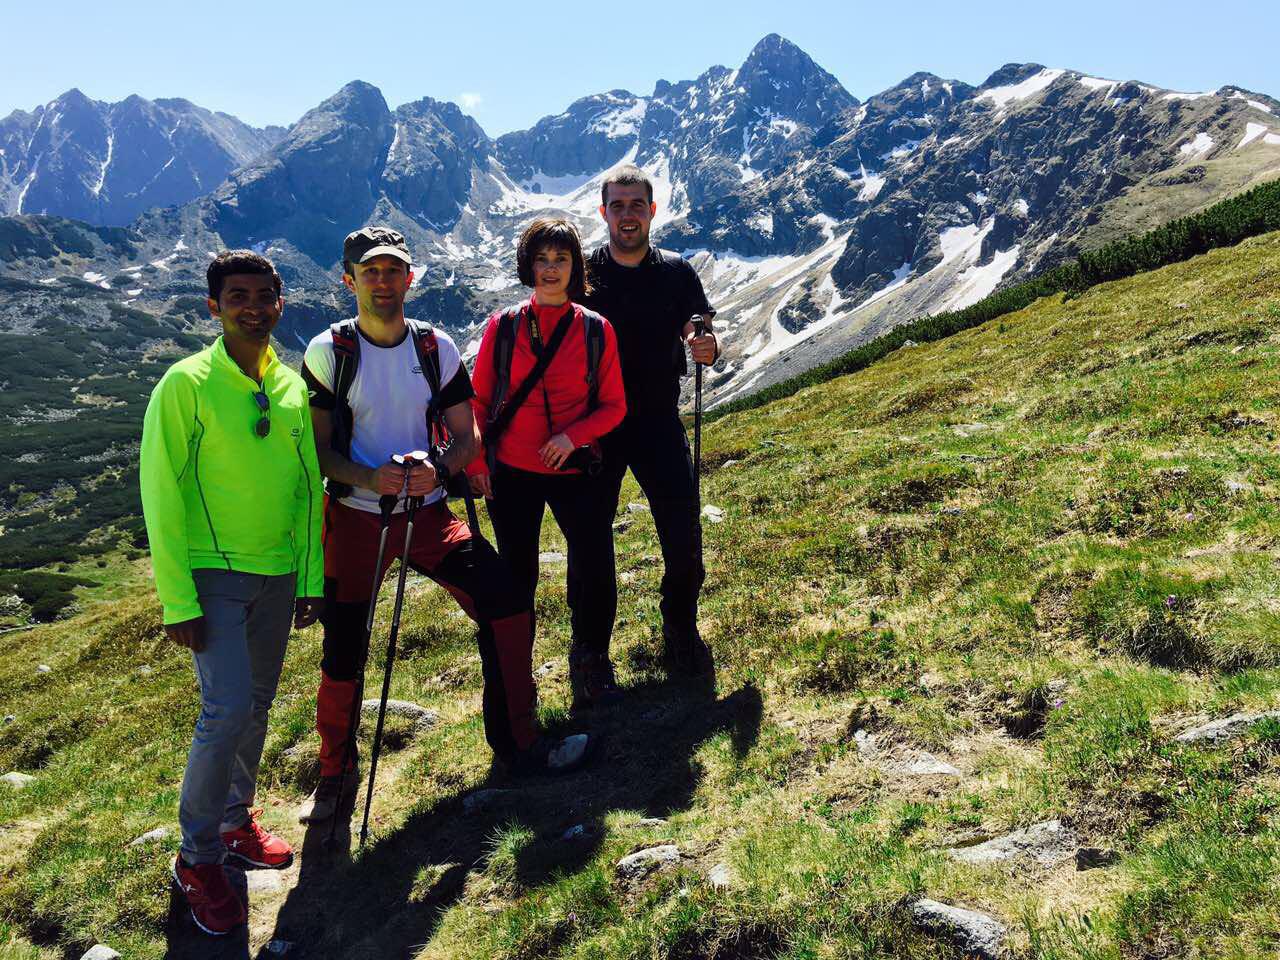 Two days in Tatras: on our way to Kasprowy Wierch